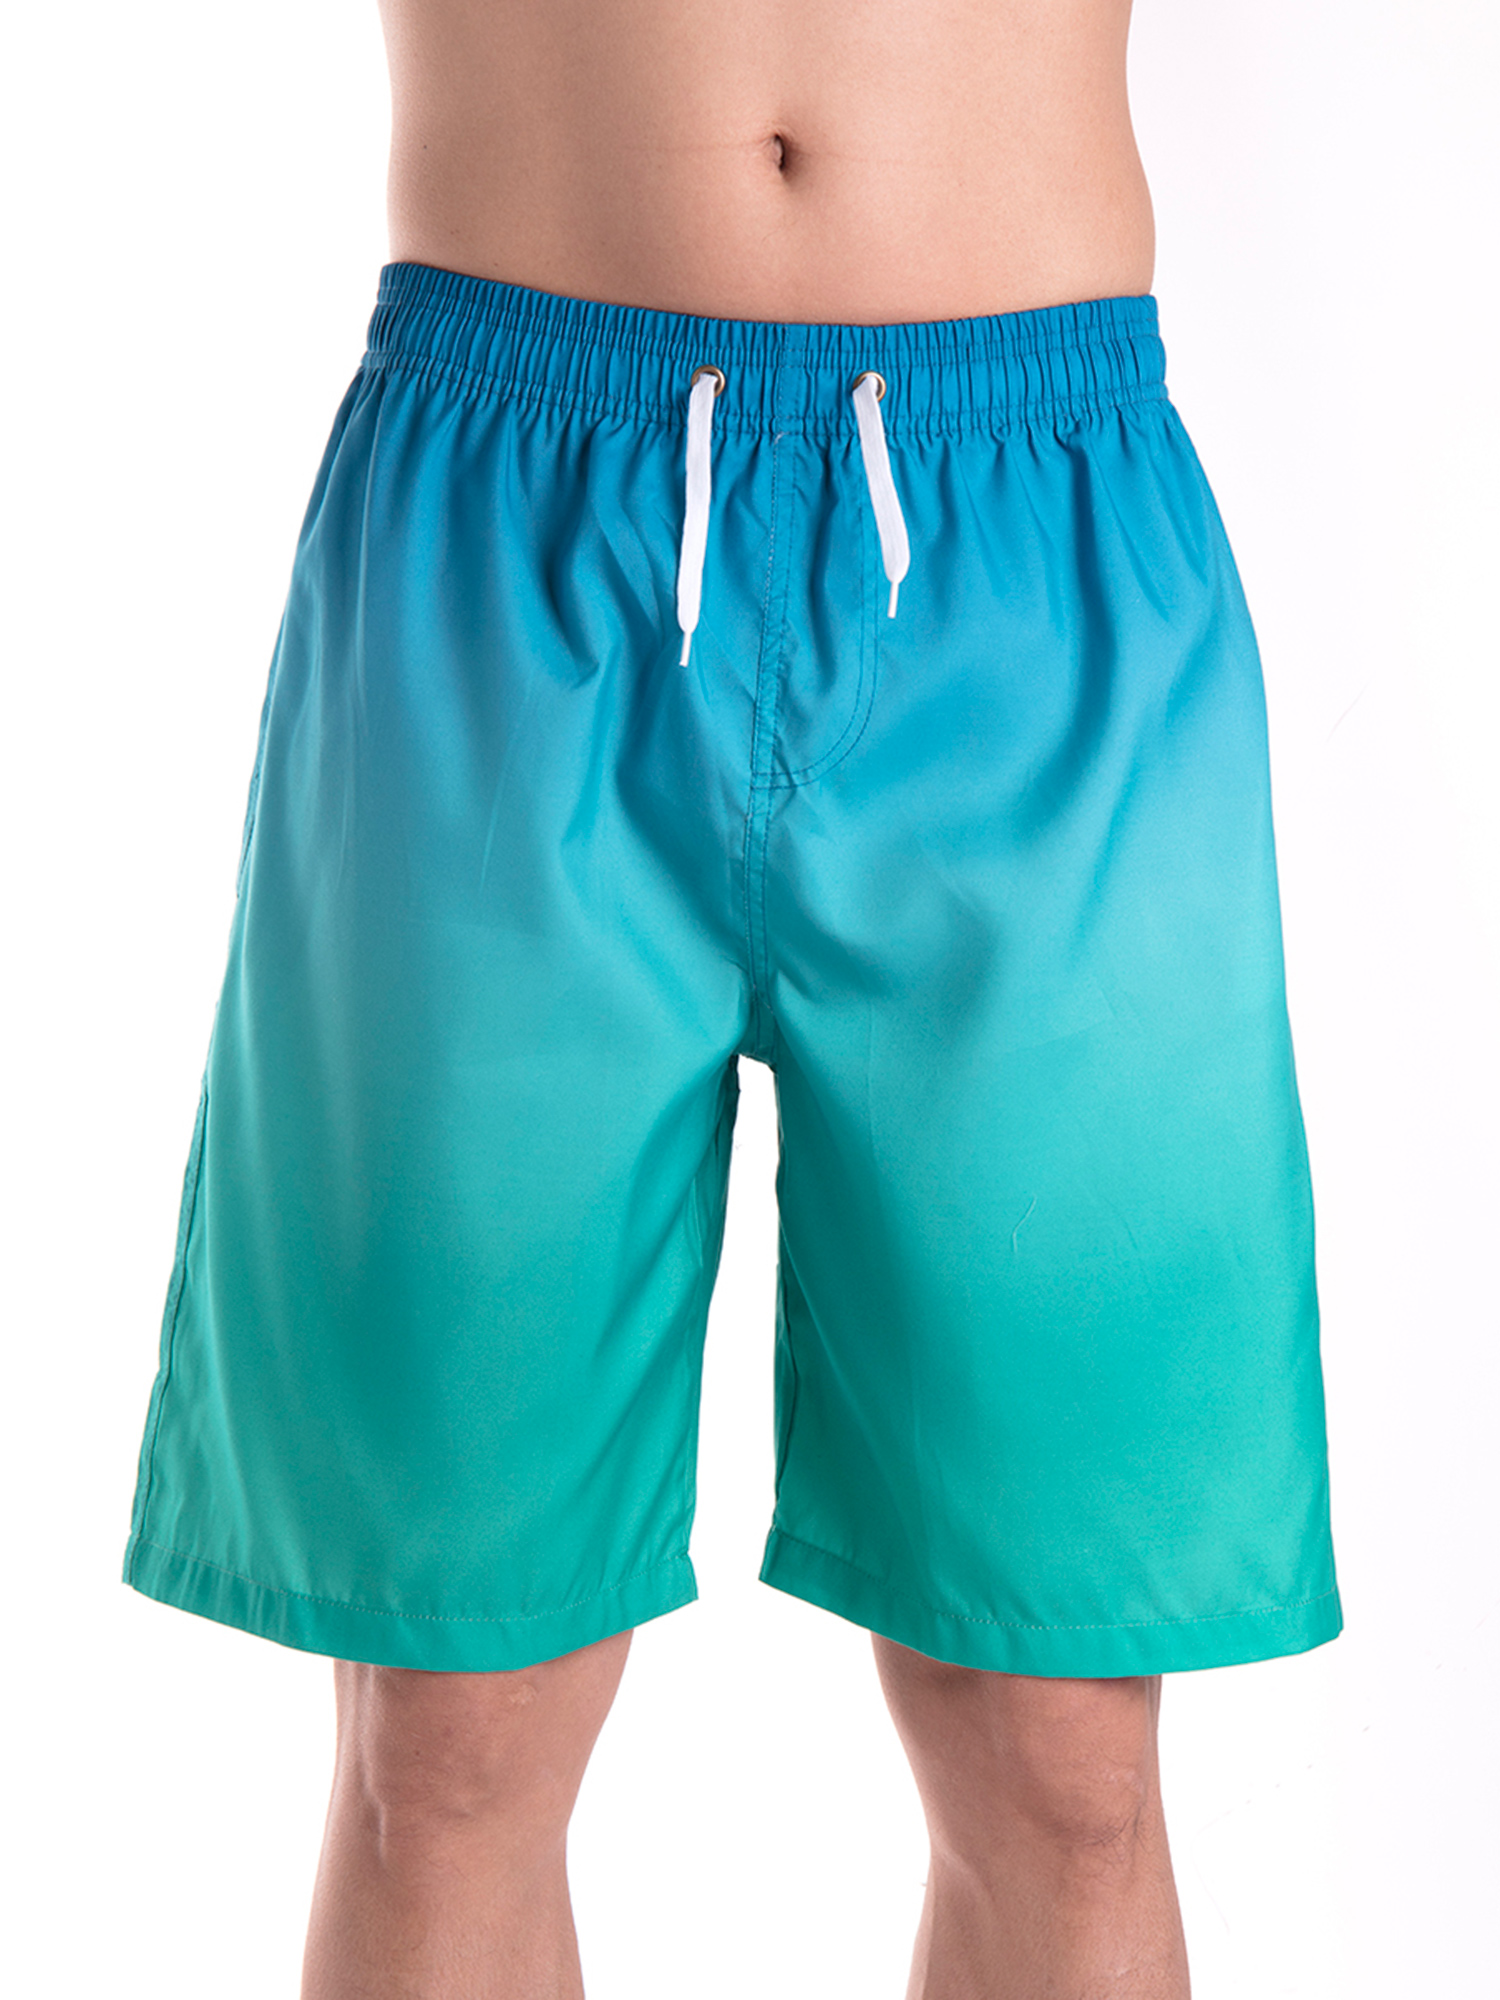 Mens Striped Unicorn Summer Holiday Quick-Drying Swim Trunks Beach Shorts Board Shorts